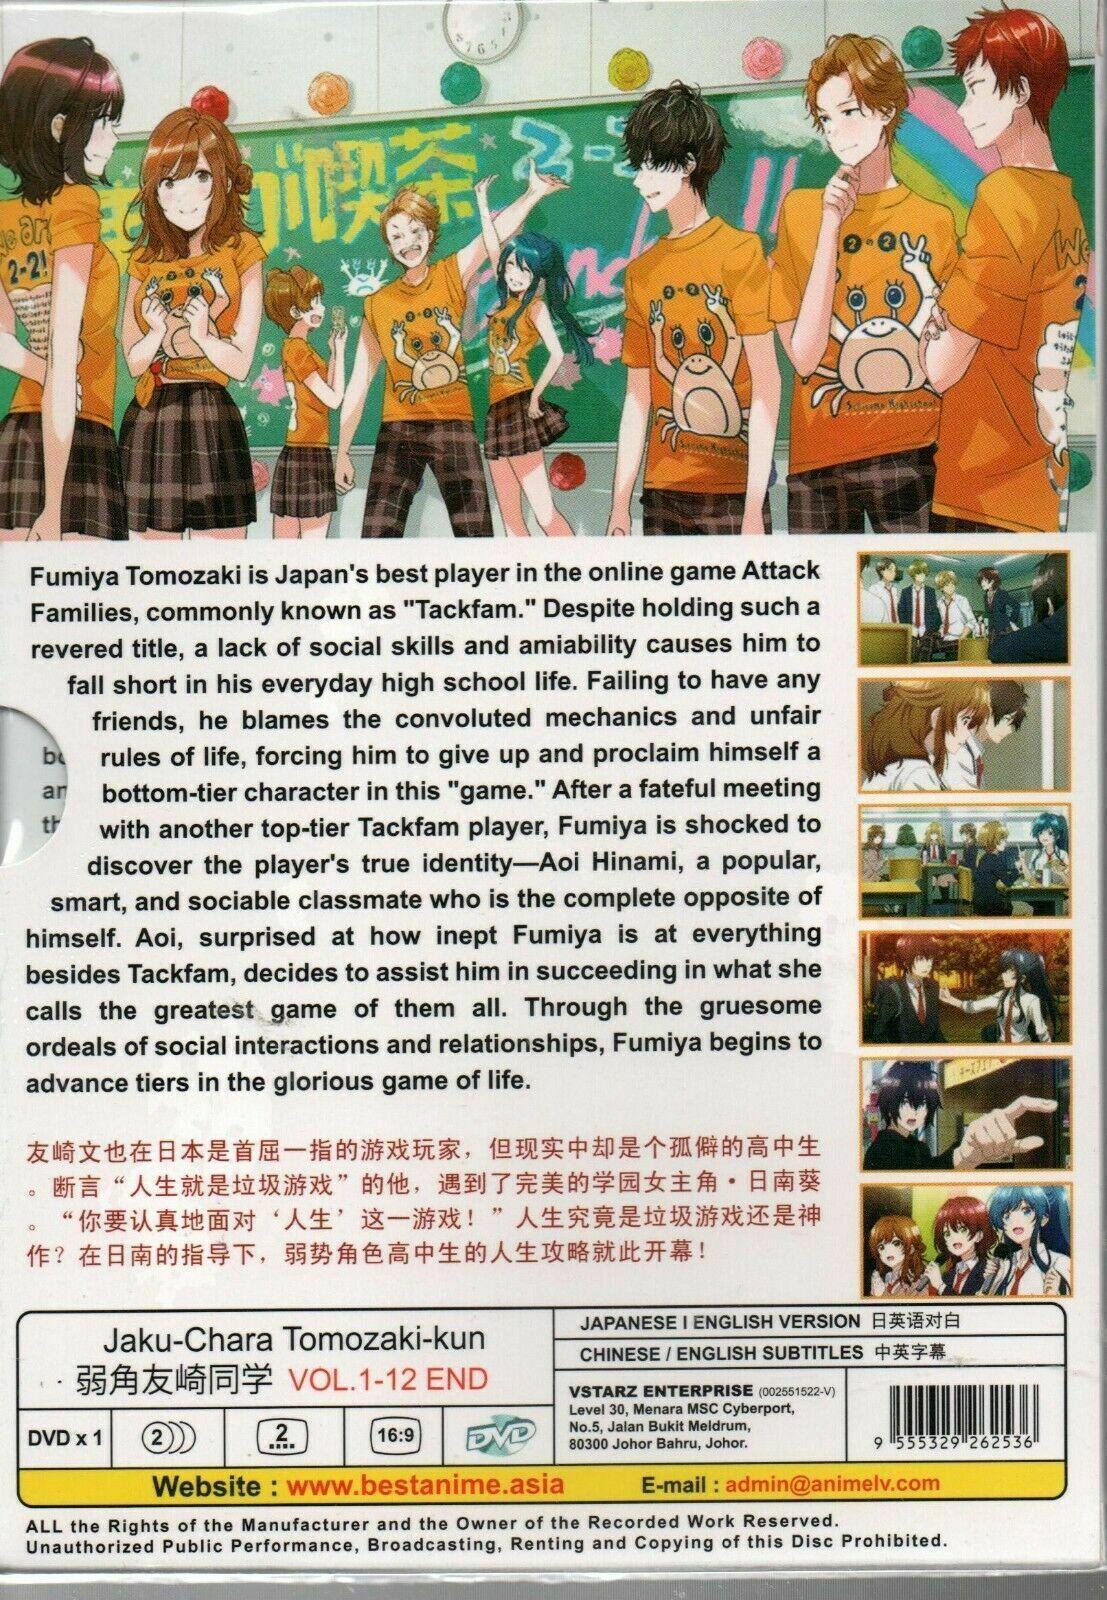 Jaku-Chara Tomozaki-Kun Vol.1-12 End English Dubbed Ship From USA